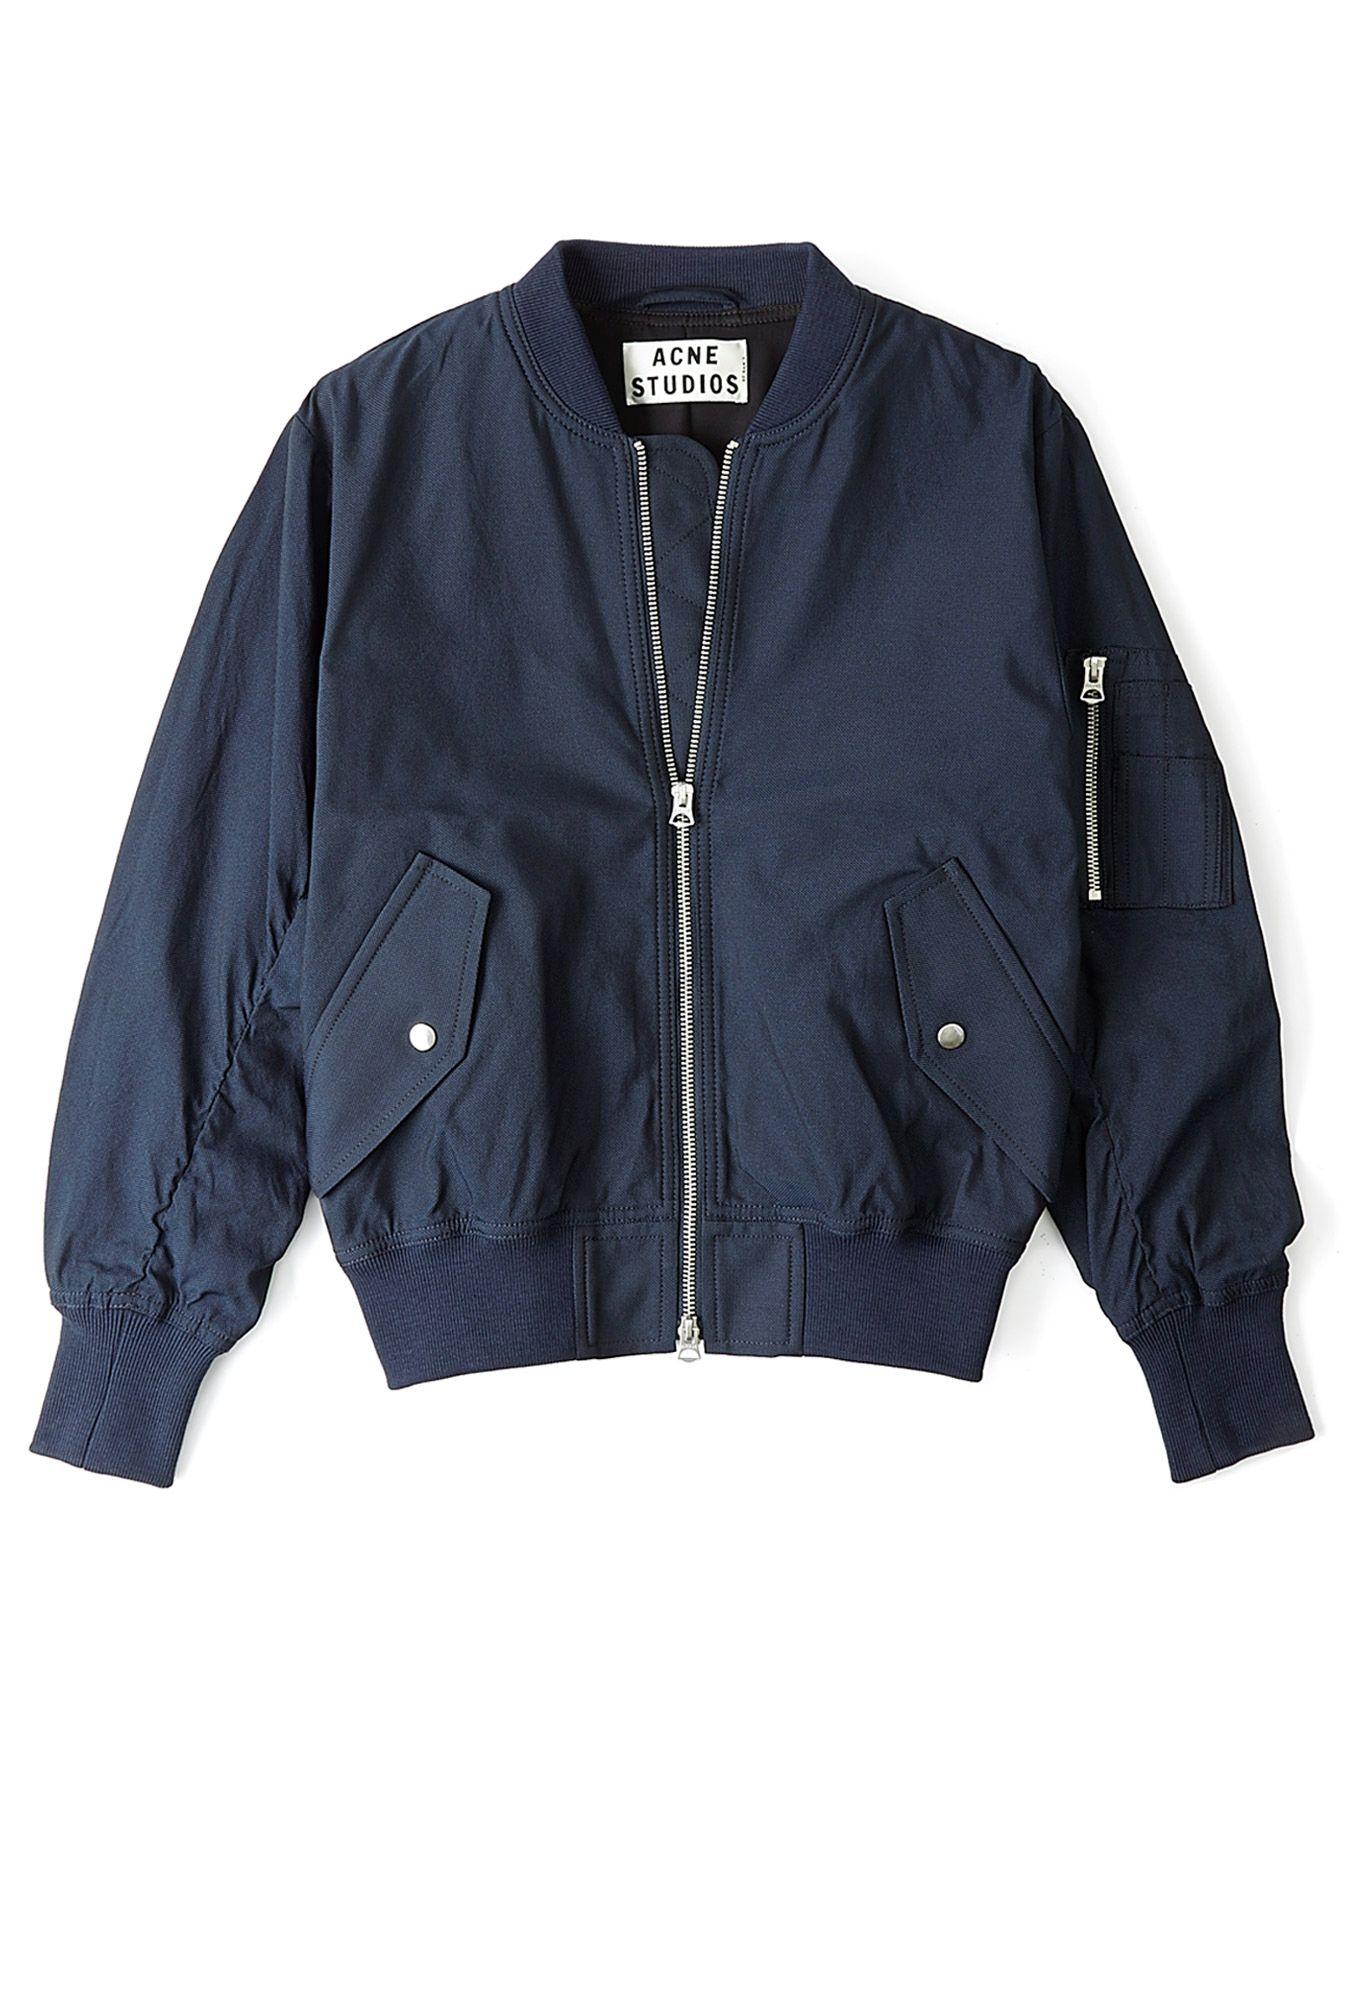 The Outnet Discount Designer Fashion Outlet Deals Up To 70 Off Bomber Jacket Jackets Blue Bomber Jacket [ 2000 x 1350 Pixel ]